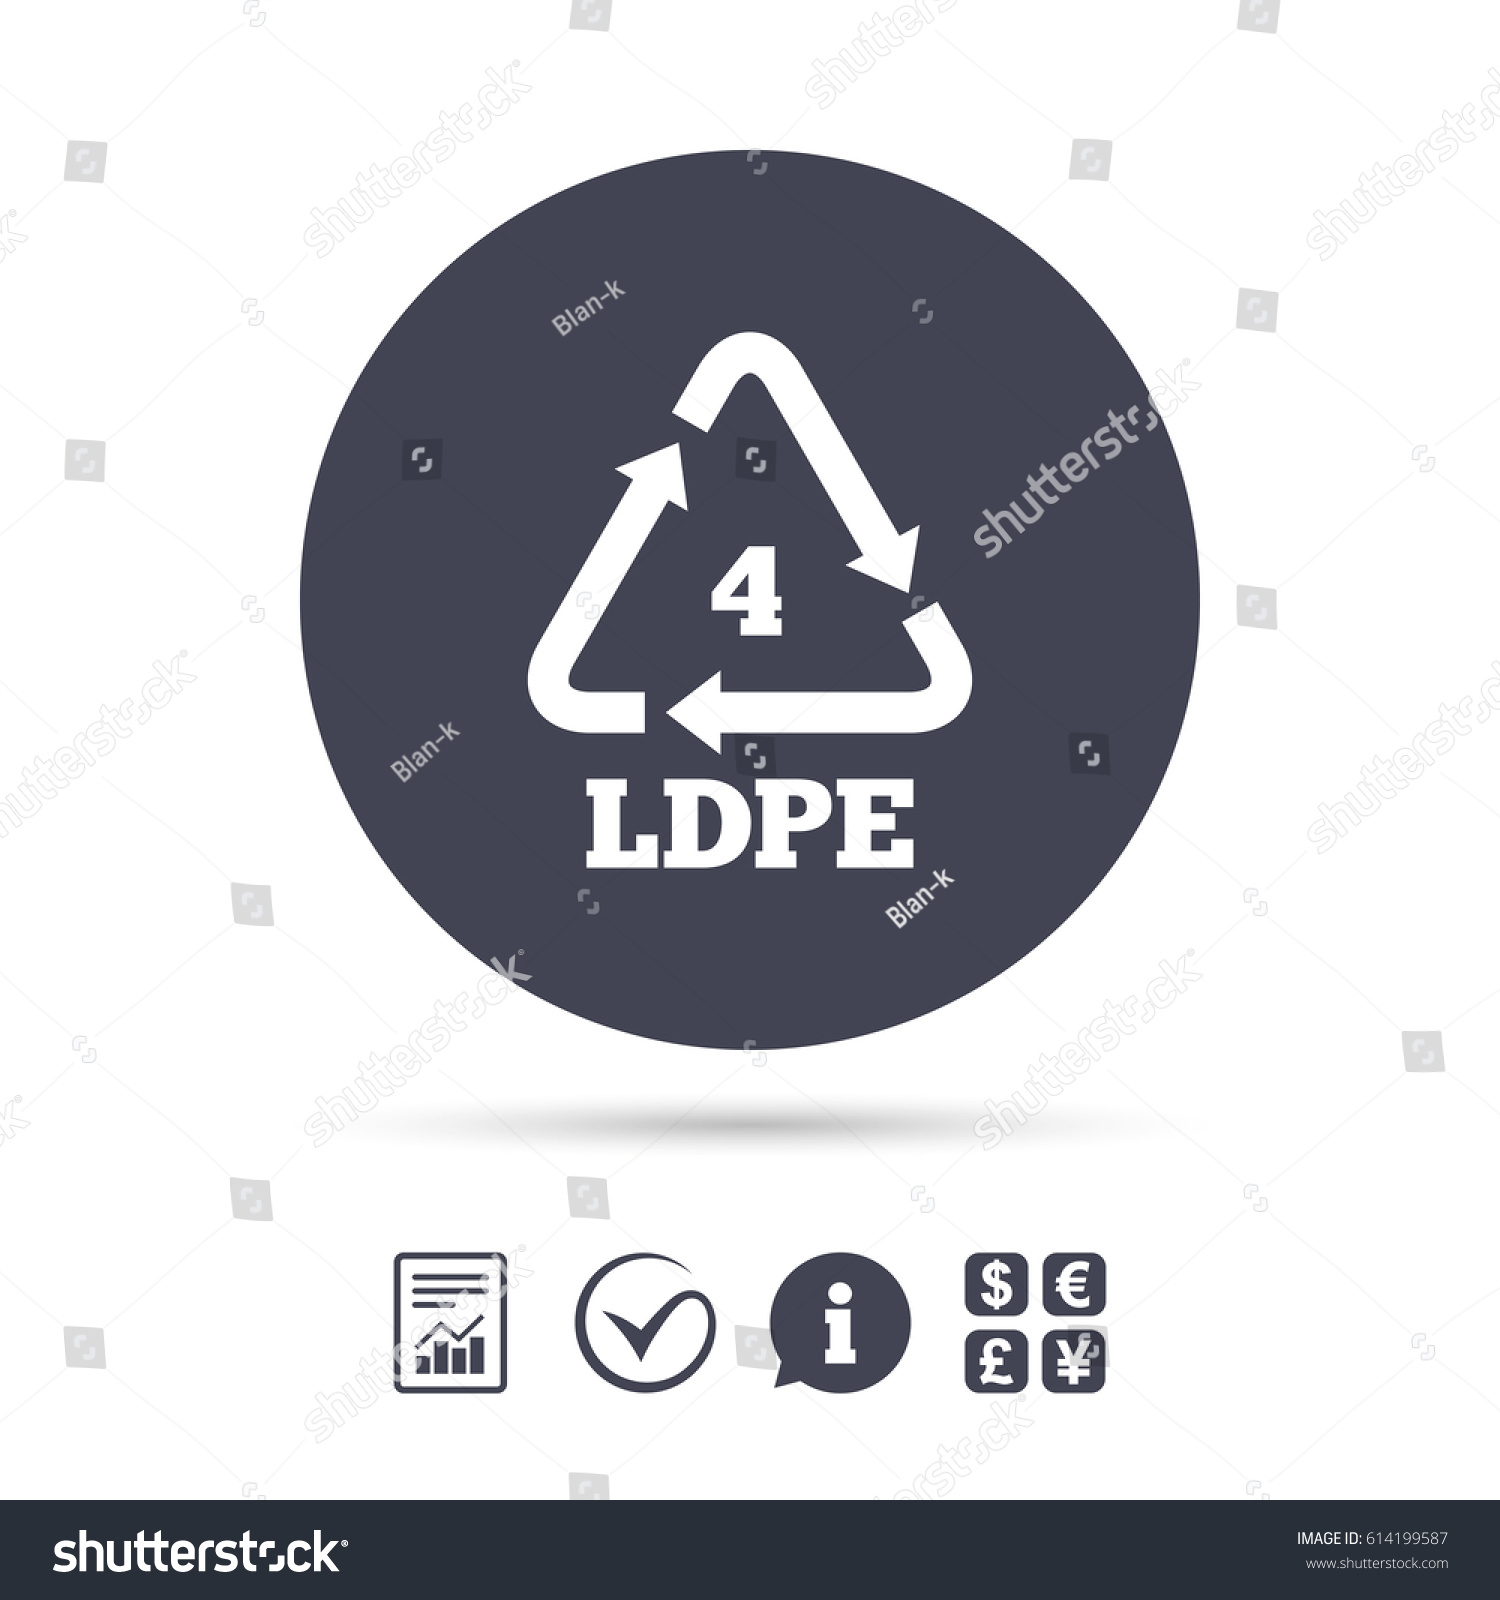 Ldpe 4 icon lowdensity polyethylene sign stock vector 614199587 ld pe 4 icon low density polyethylene sign recycling symbol report biocorpaavc Choice Image